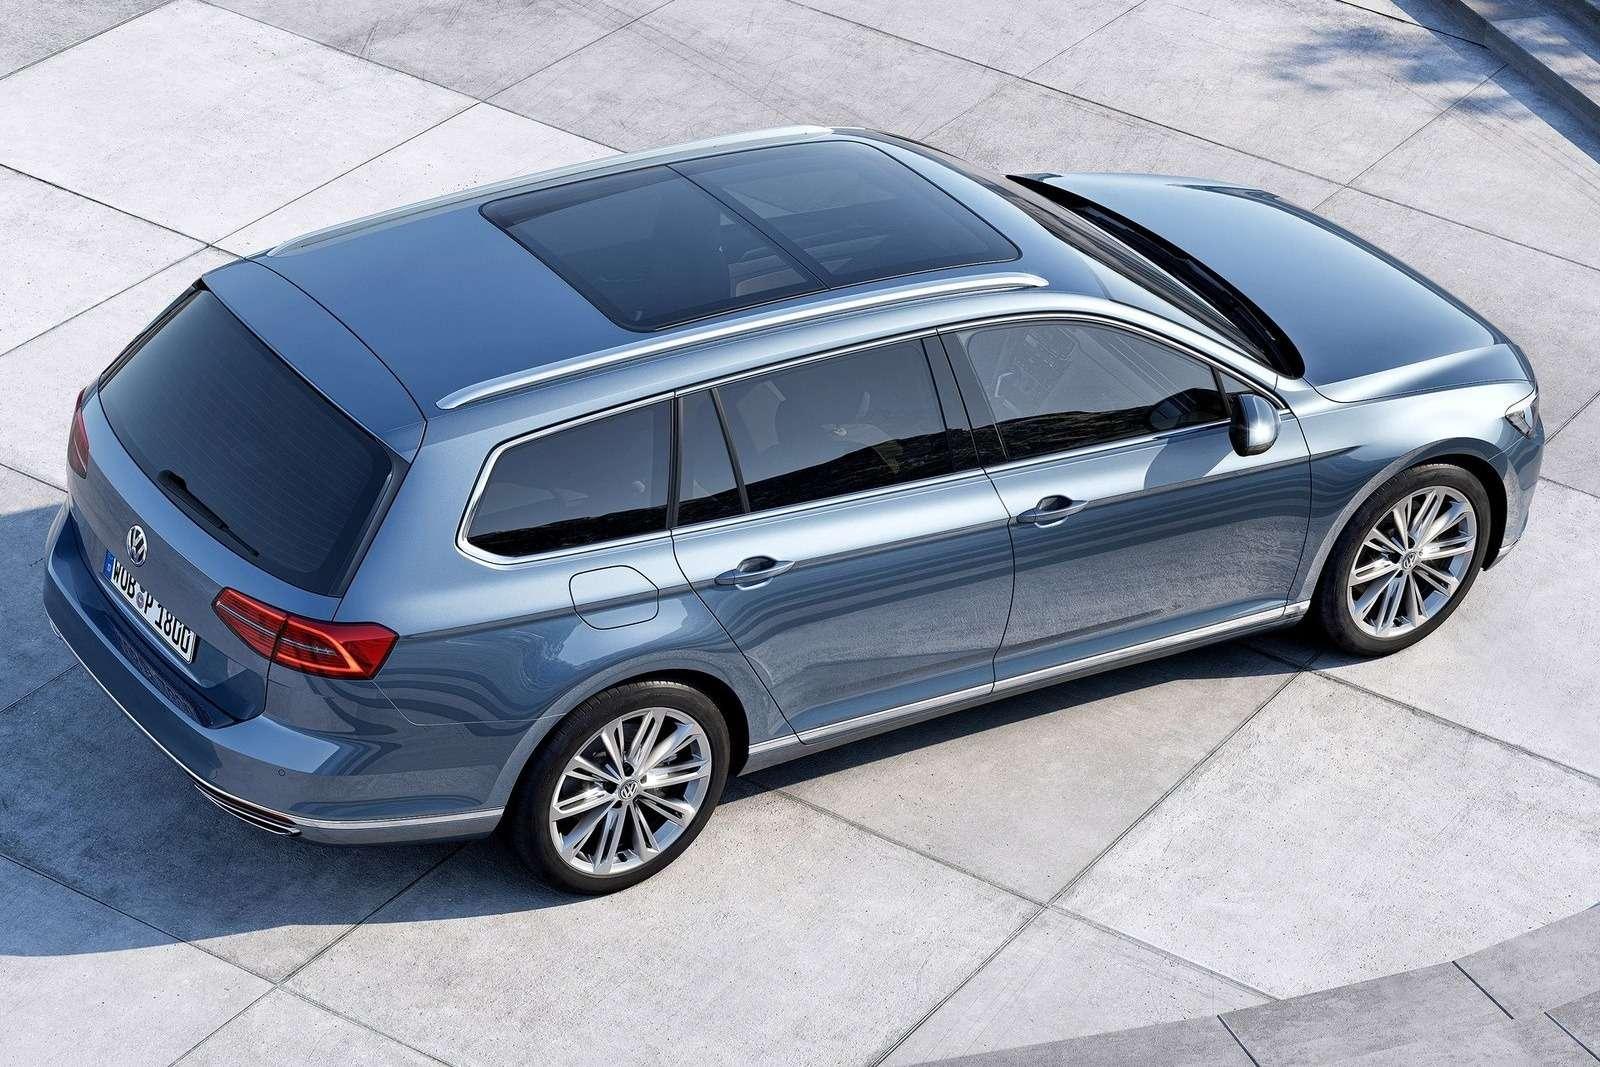 Volkswagen-Passat_Variant_2015_1600x1200_wallpaper_0e